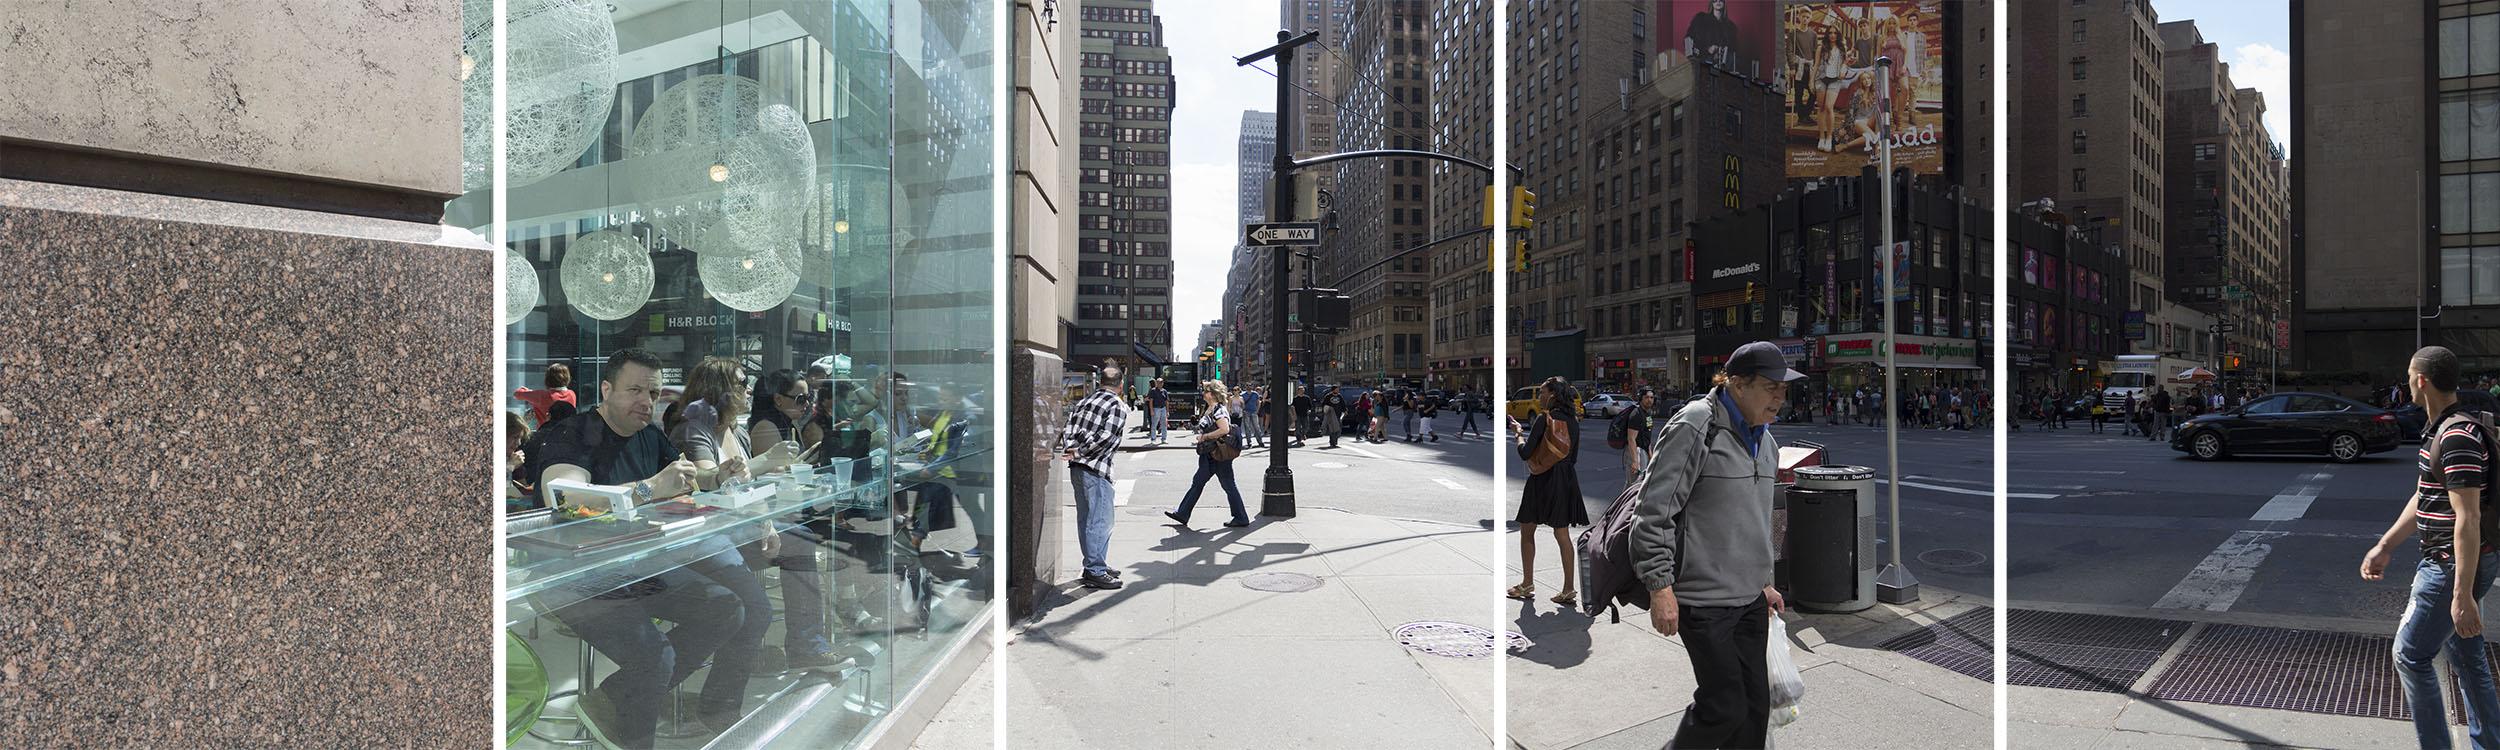 New York, Manhattan,4-18-2015,6373-6413